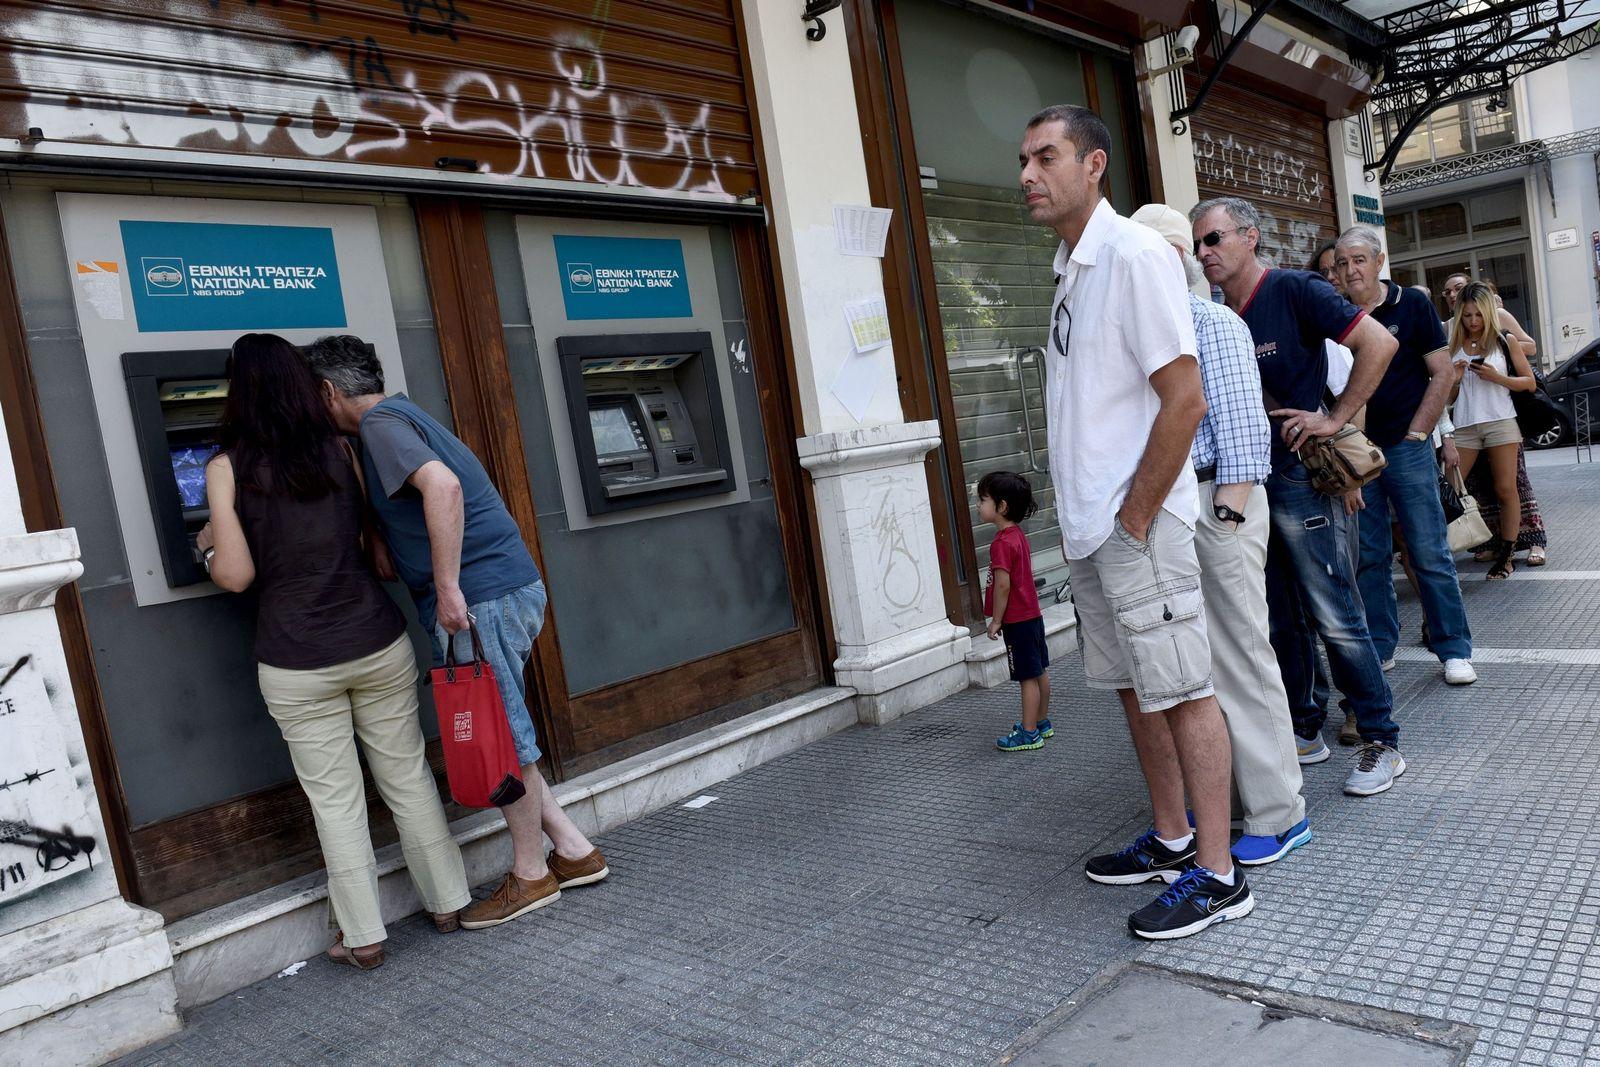 Griechenland / Banken